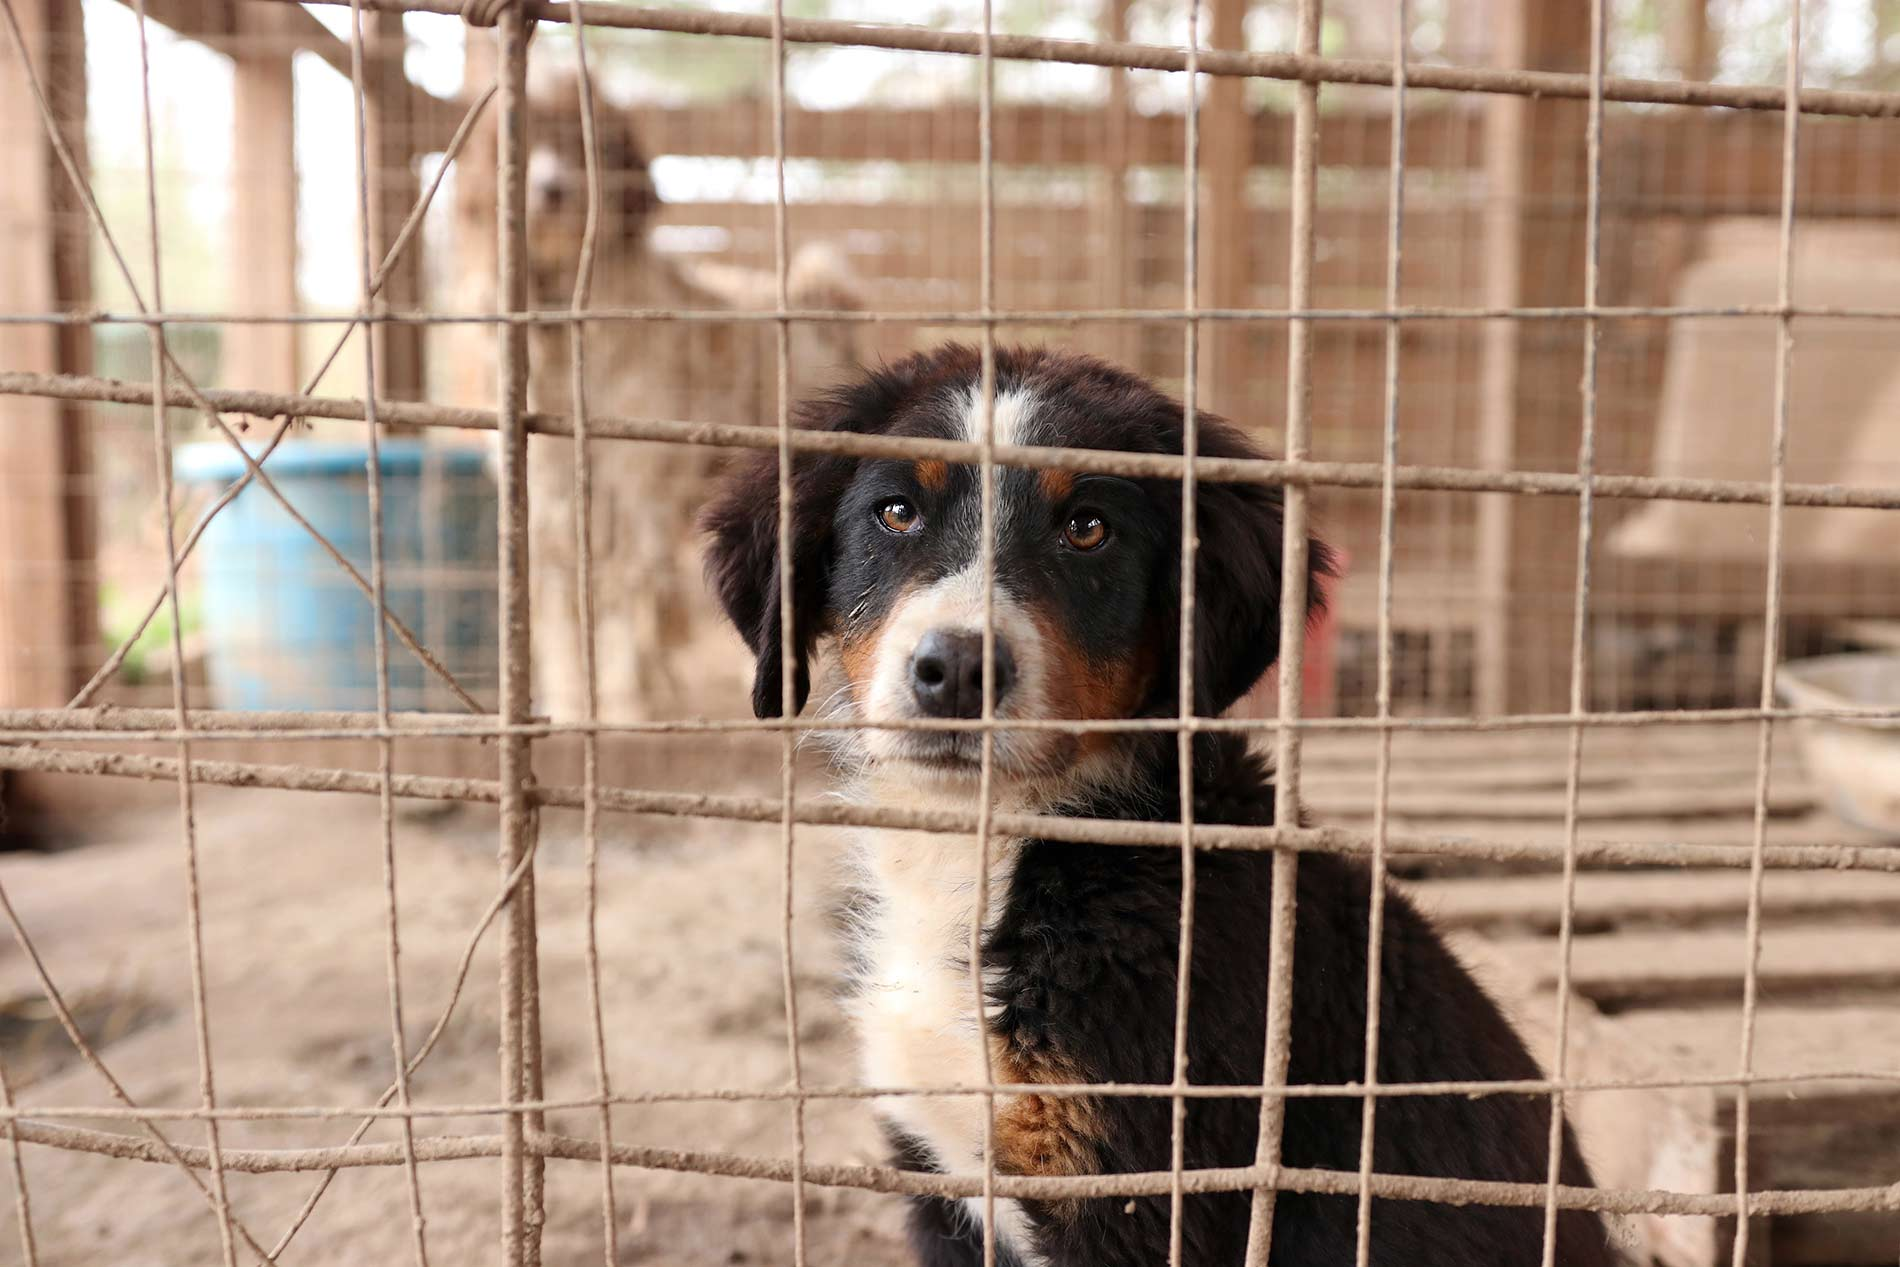 Cruelty Investigation